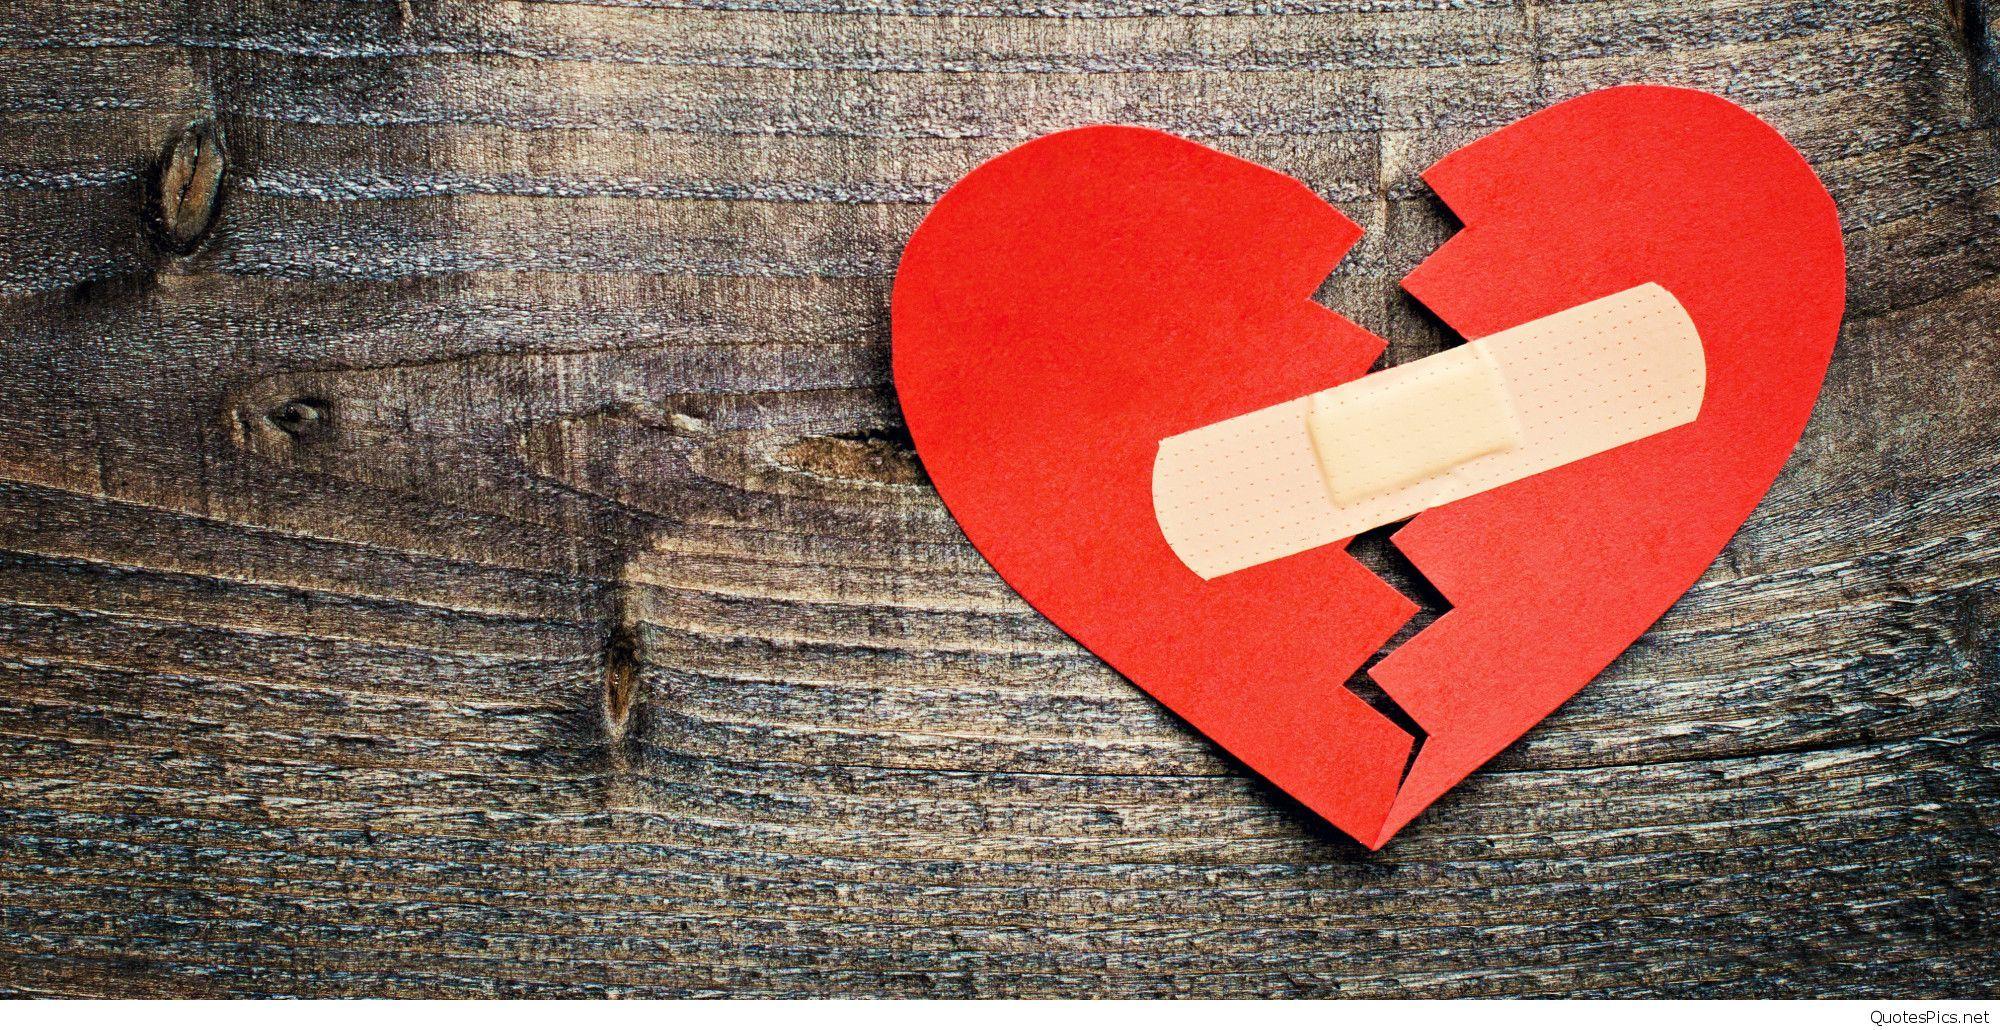 60 Broken Heart Wallpapers   Download at WallpaperBro 2000x1030